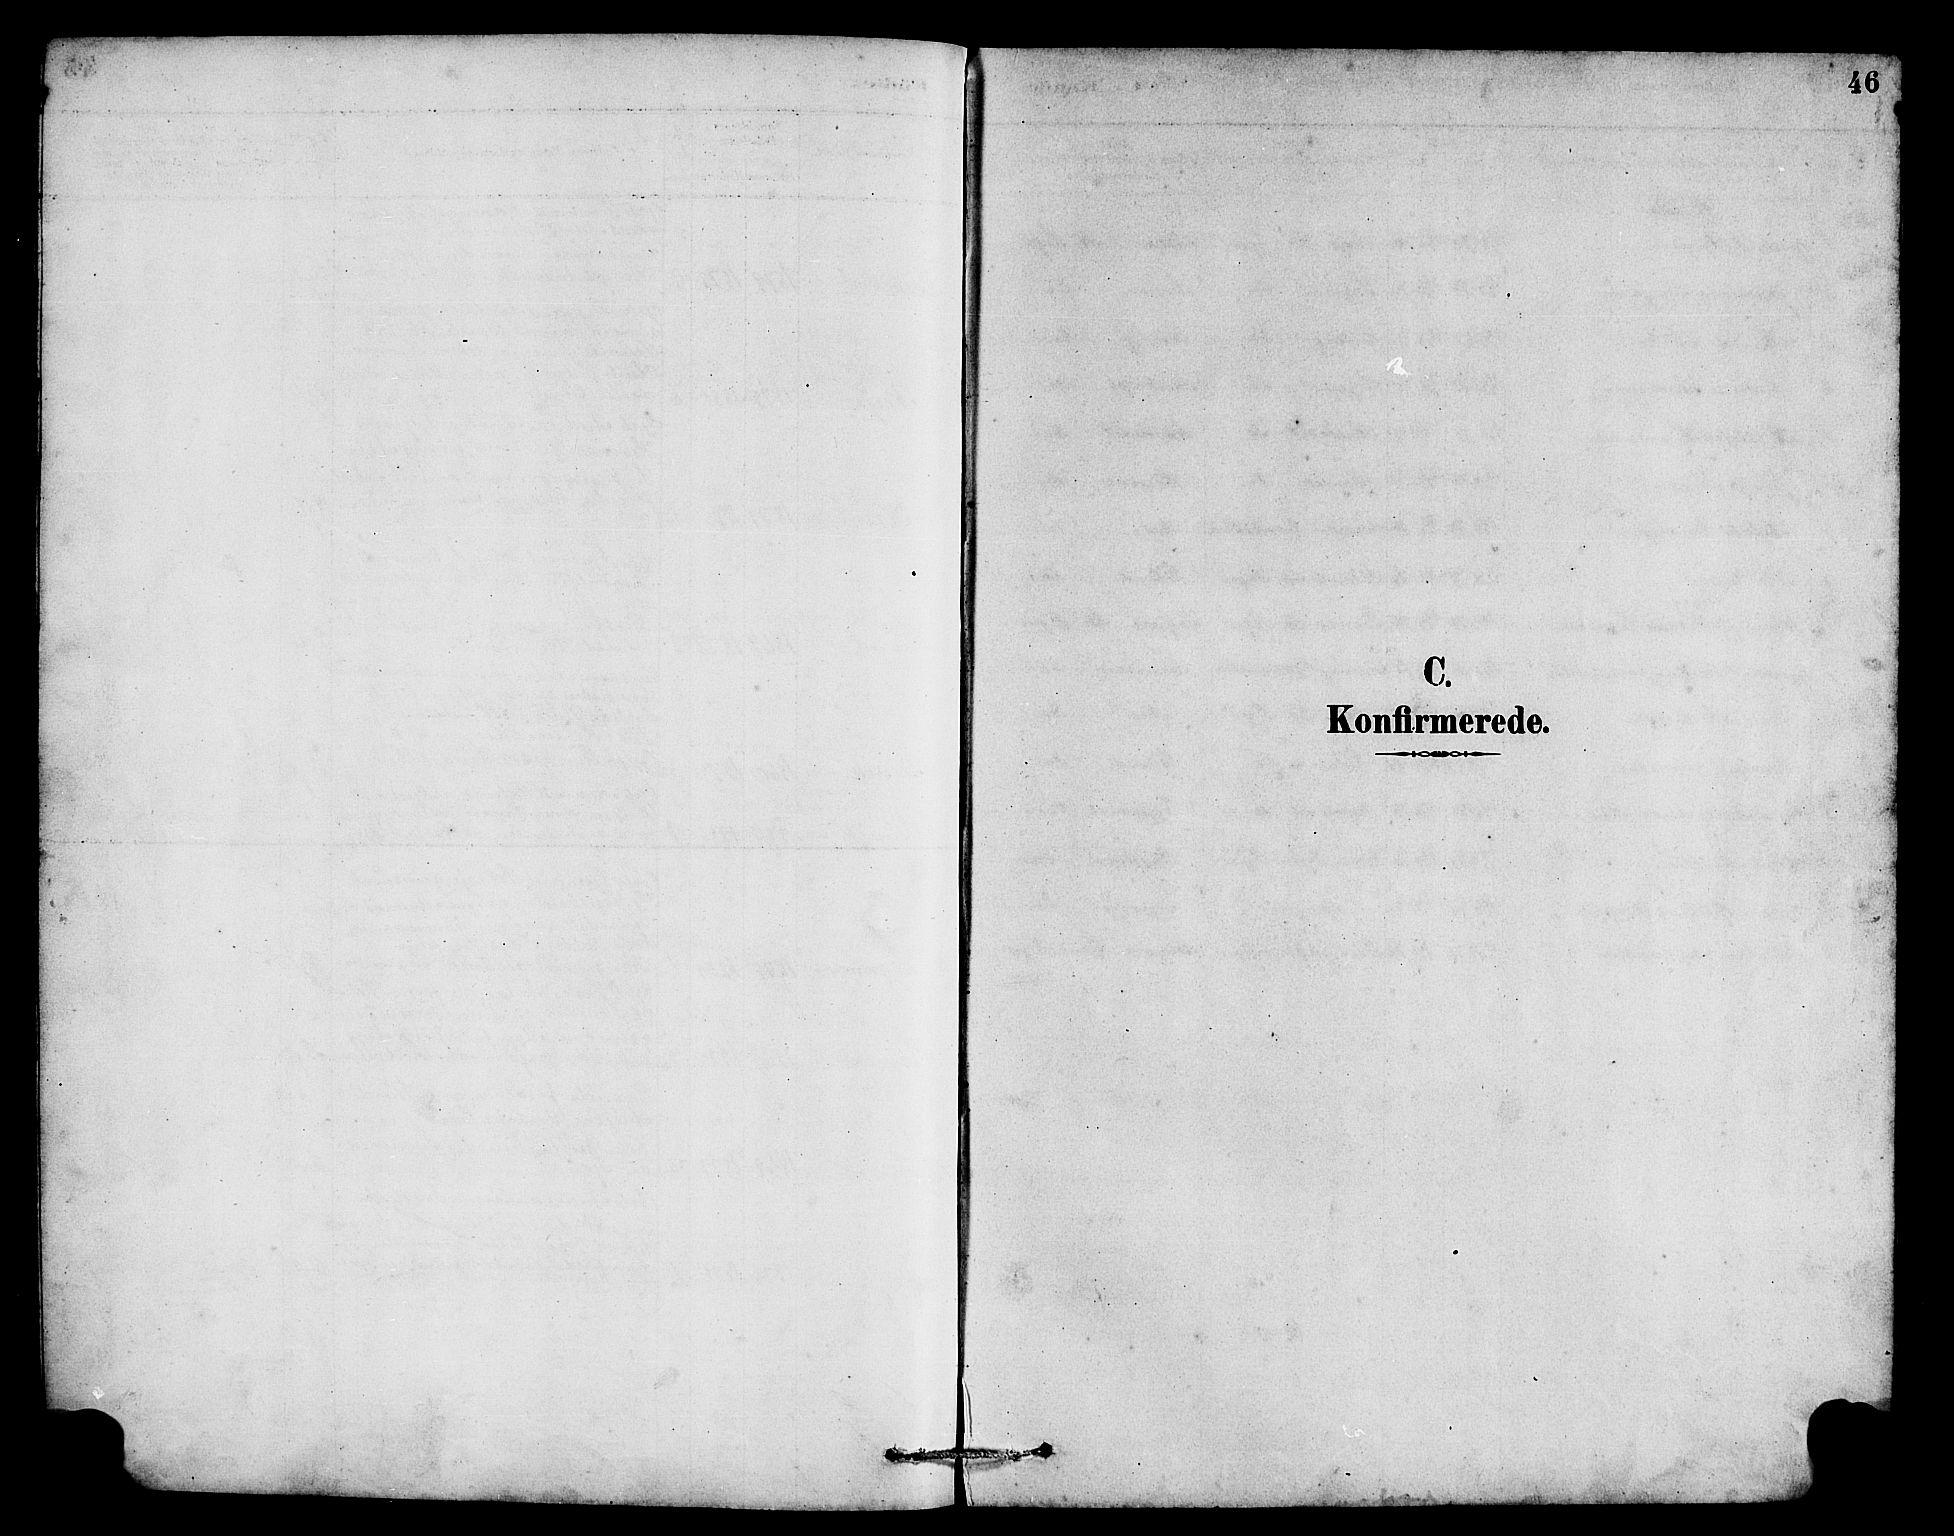 SAB, Hyllestad Sokneprestembete, Parish register (copy) no. B 2, 1889-1915, p. 46